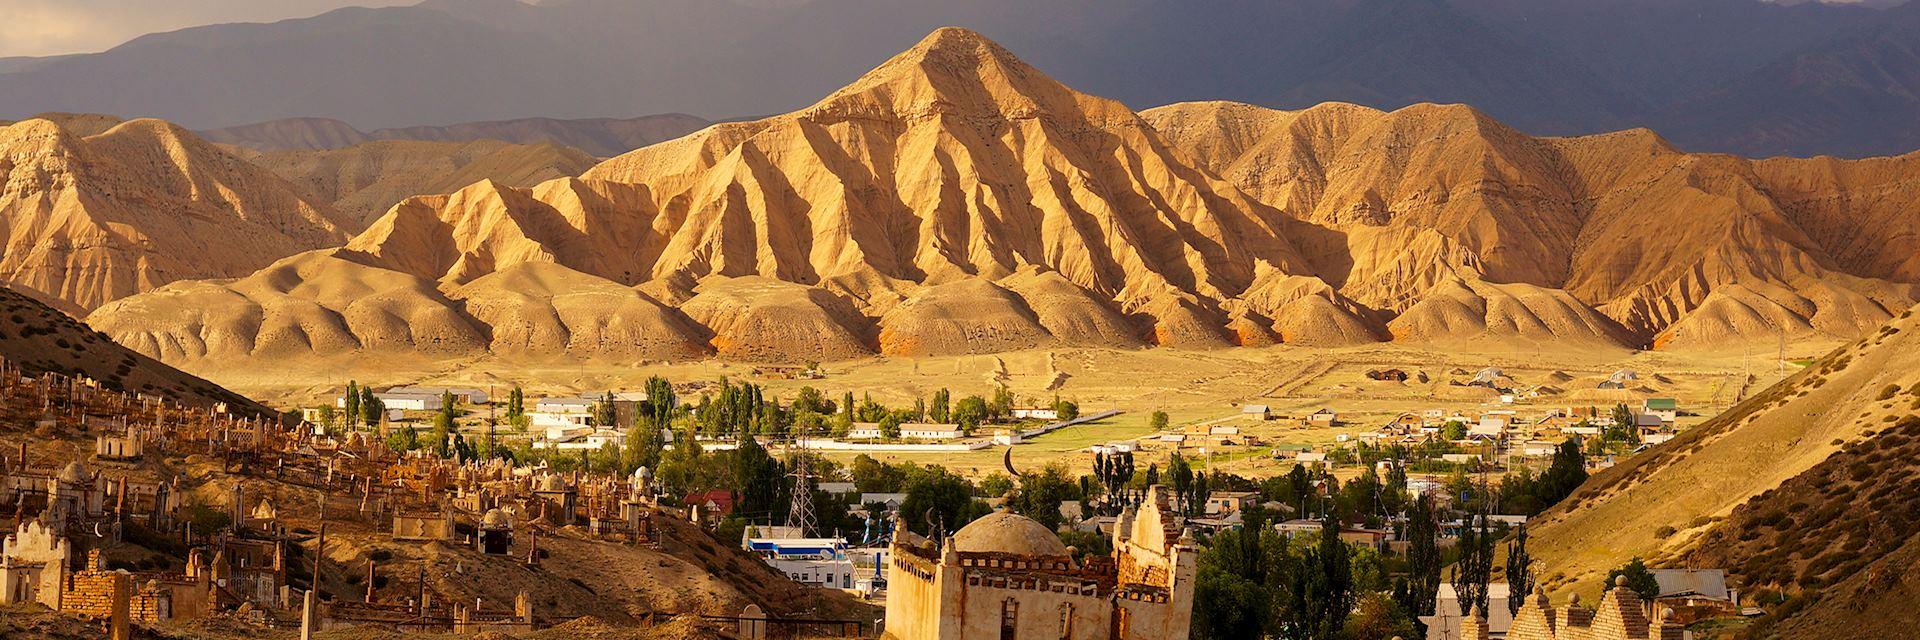 Naryn town in Kyrgyzstan